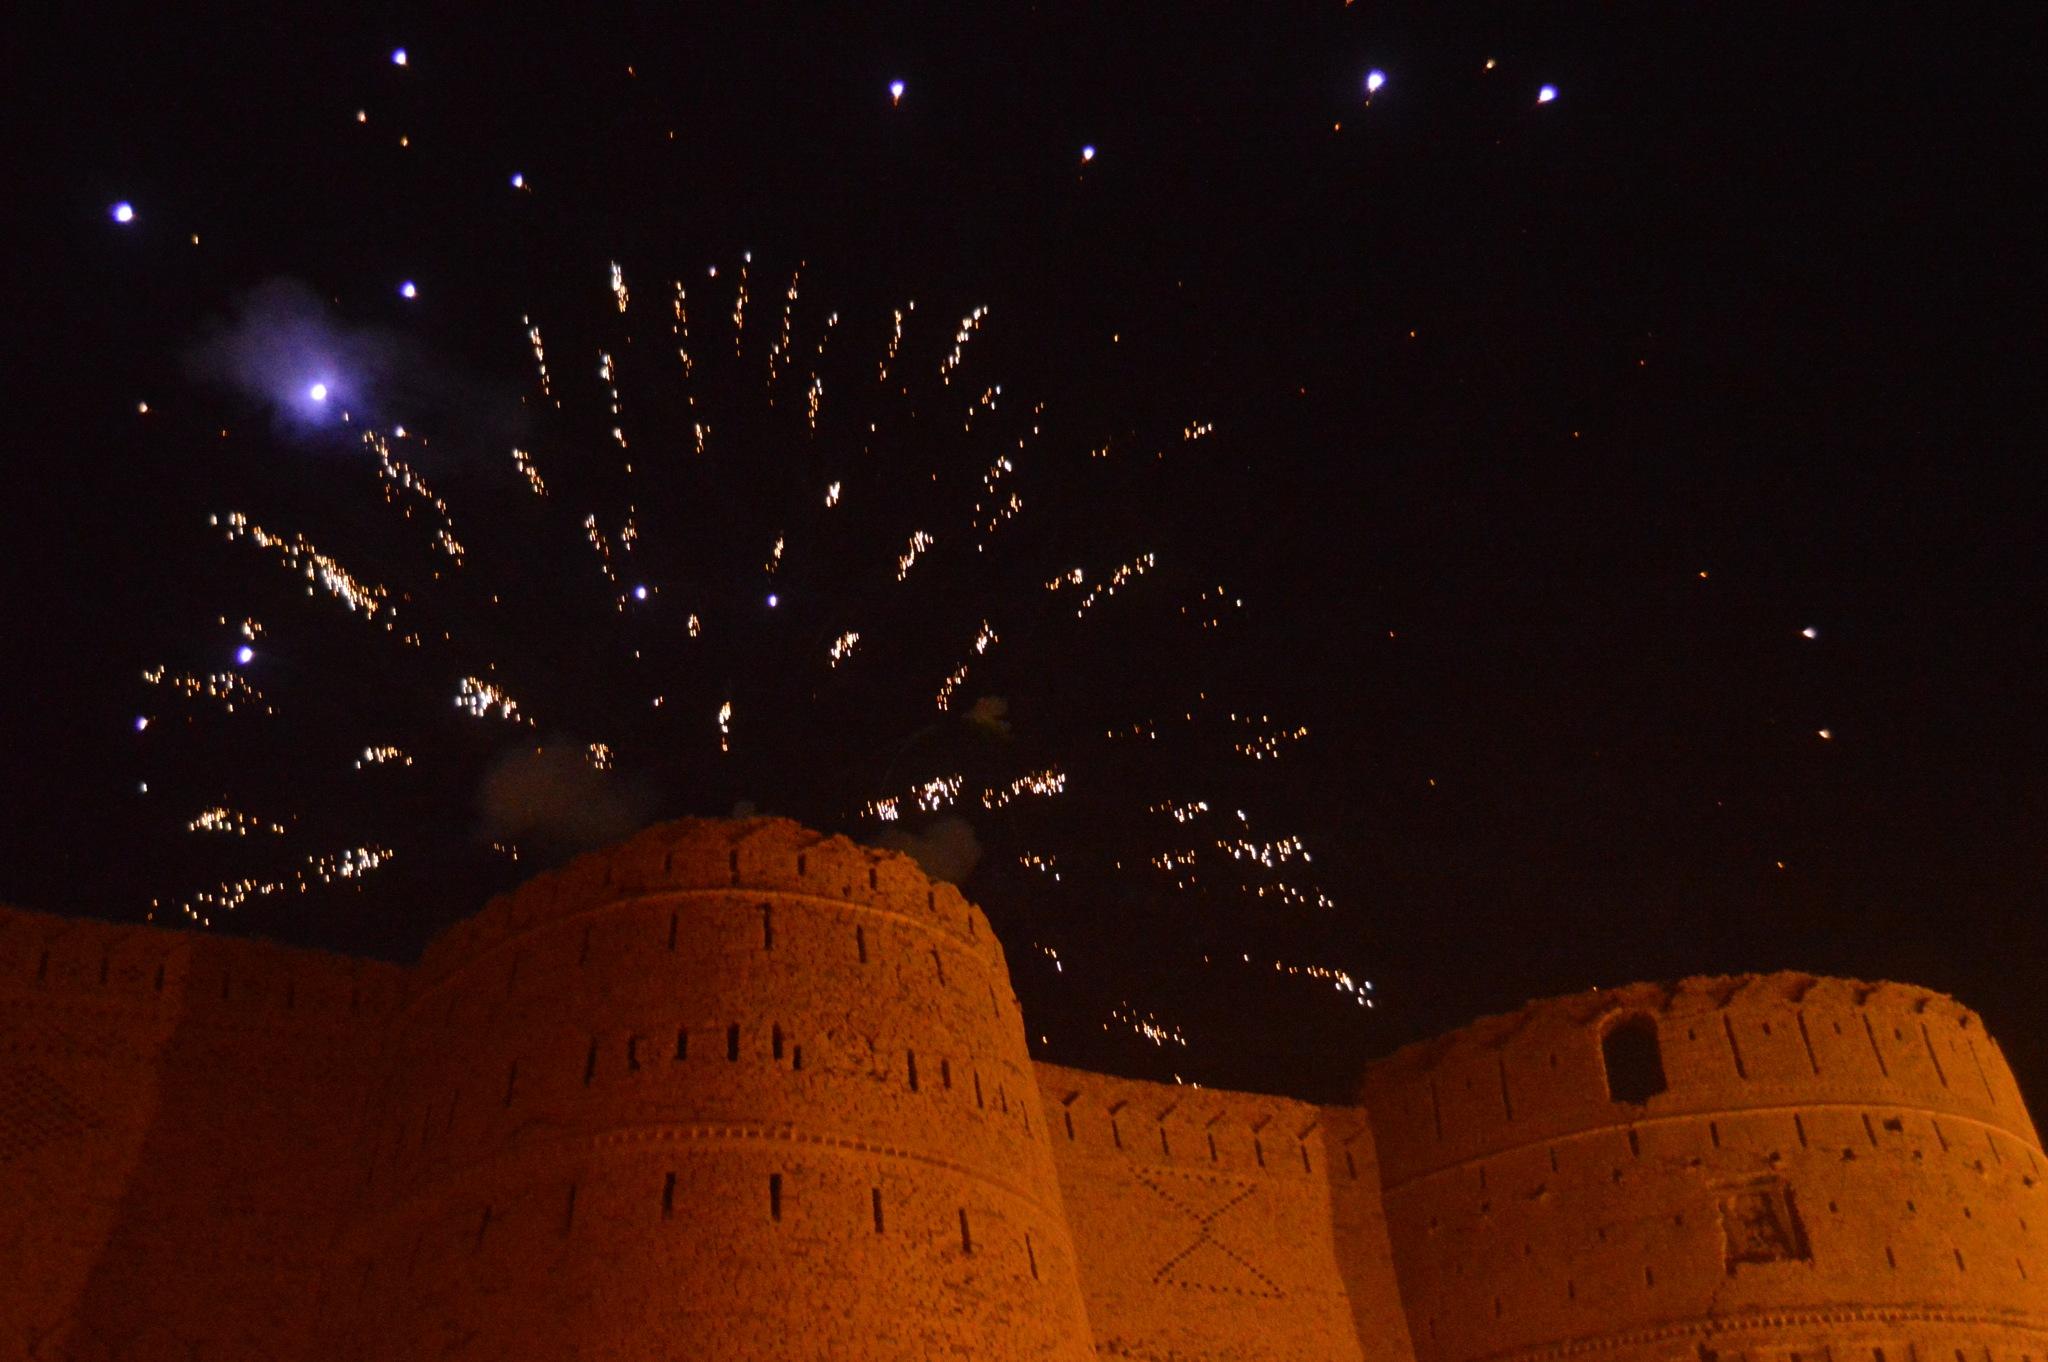 Fire Wort at Derawar Fort, Cholistan Desert, Bahawalpur, Pakistan. by pervaiz_jiu-jitsu